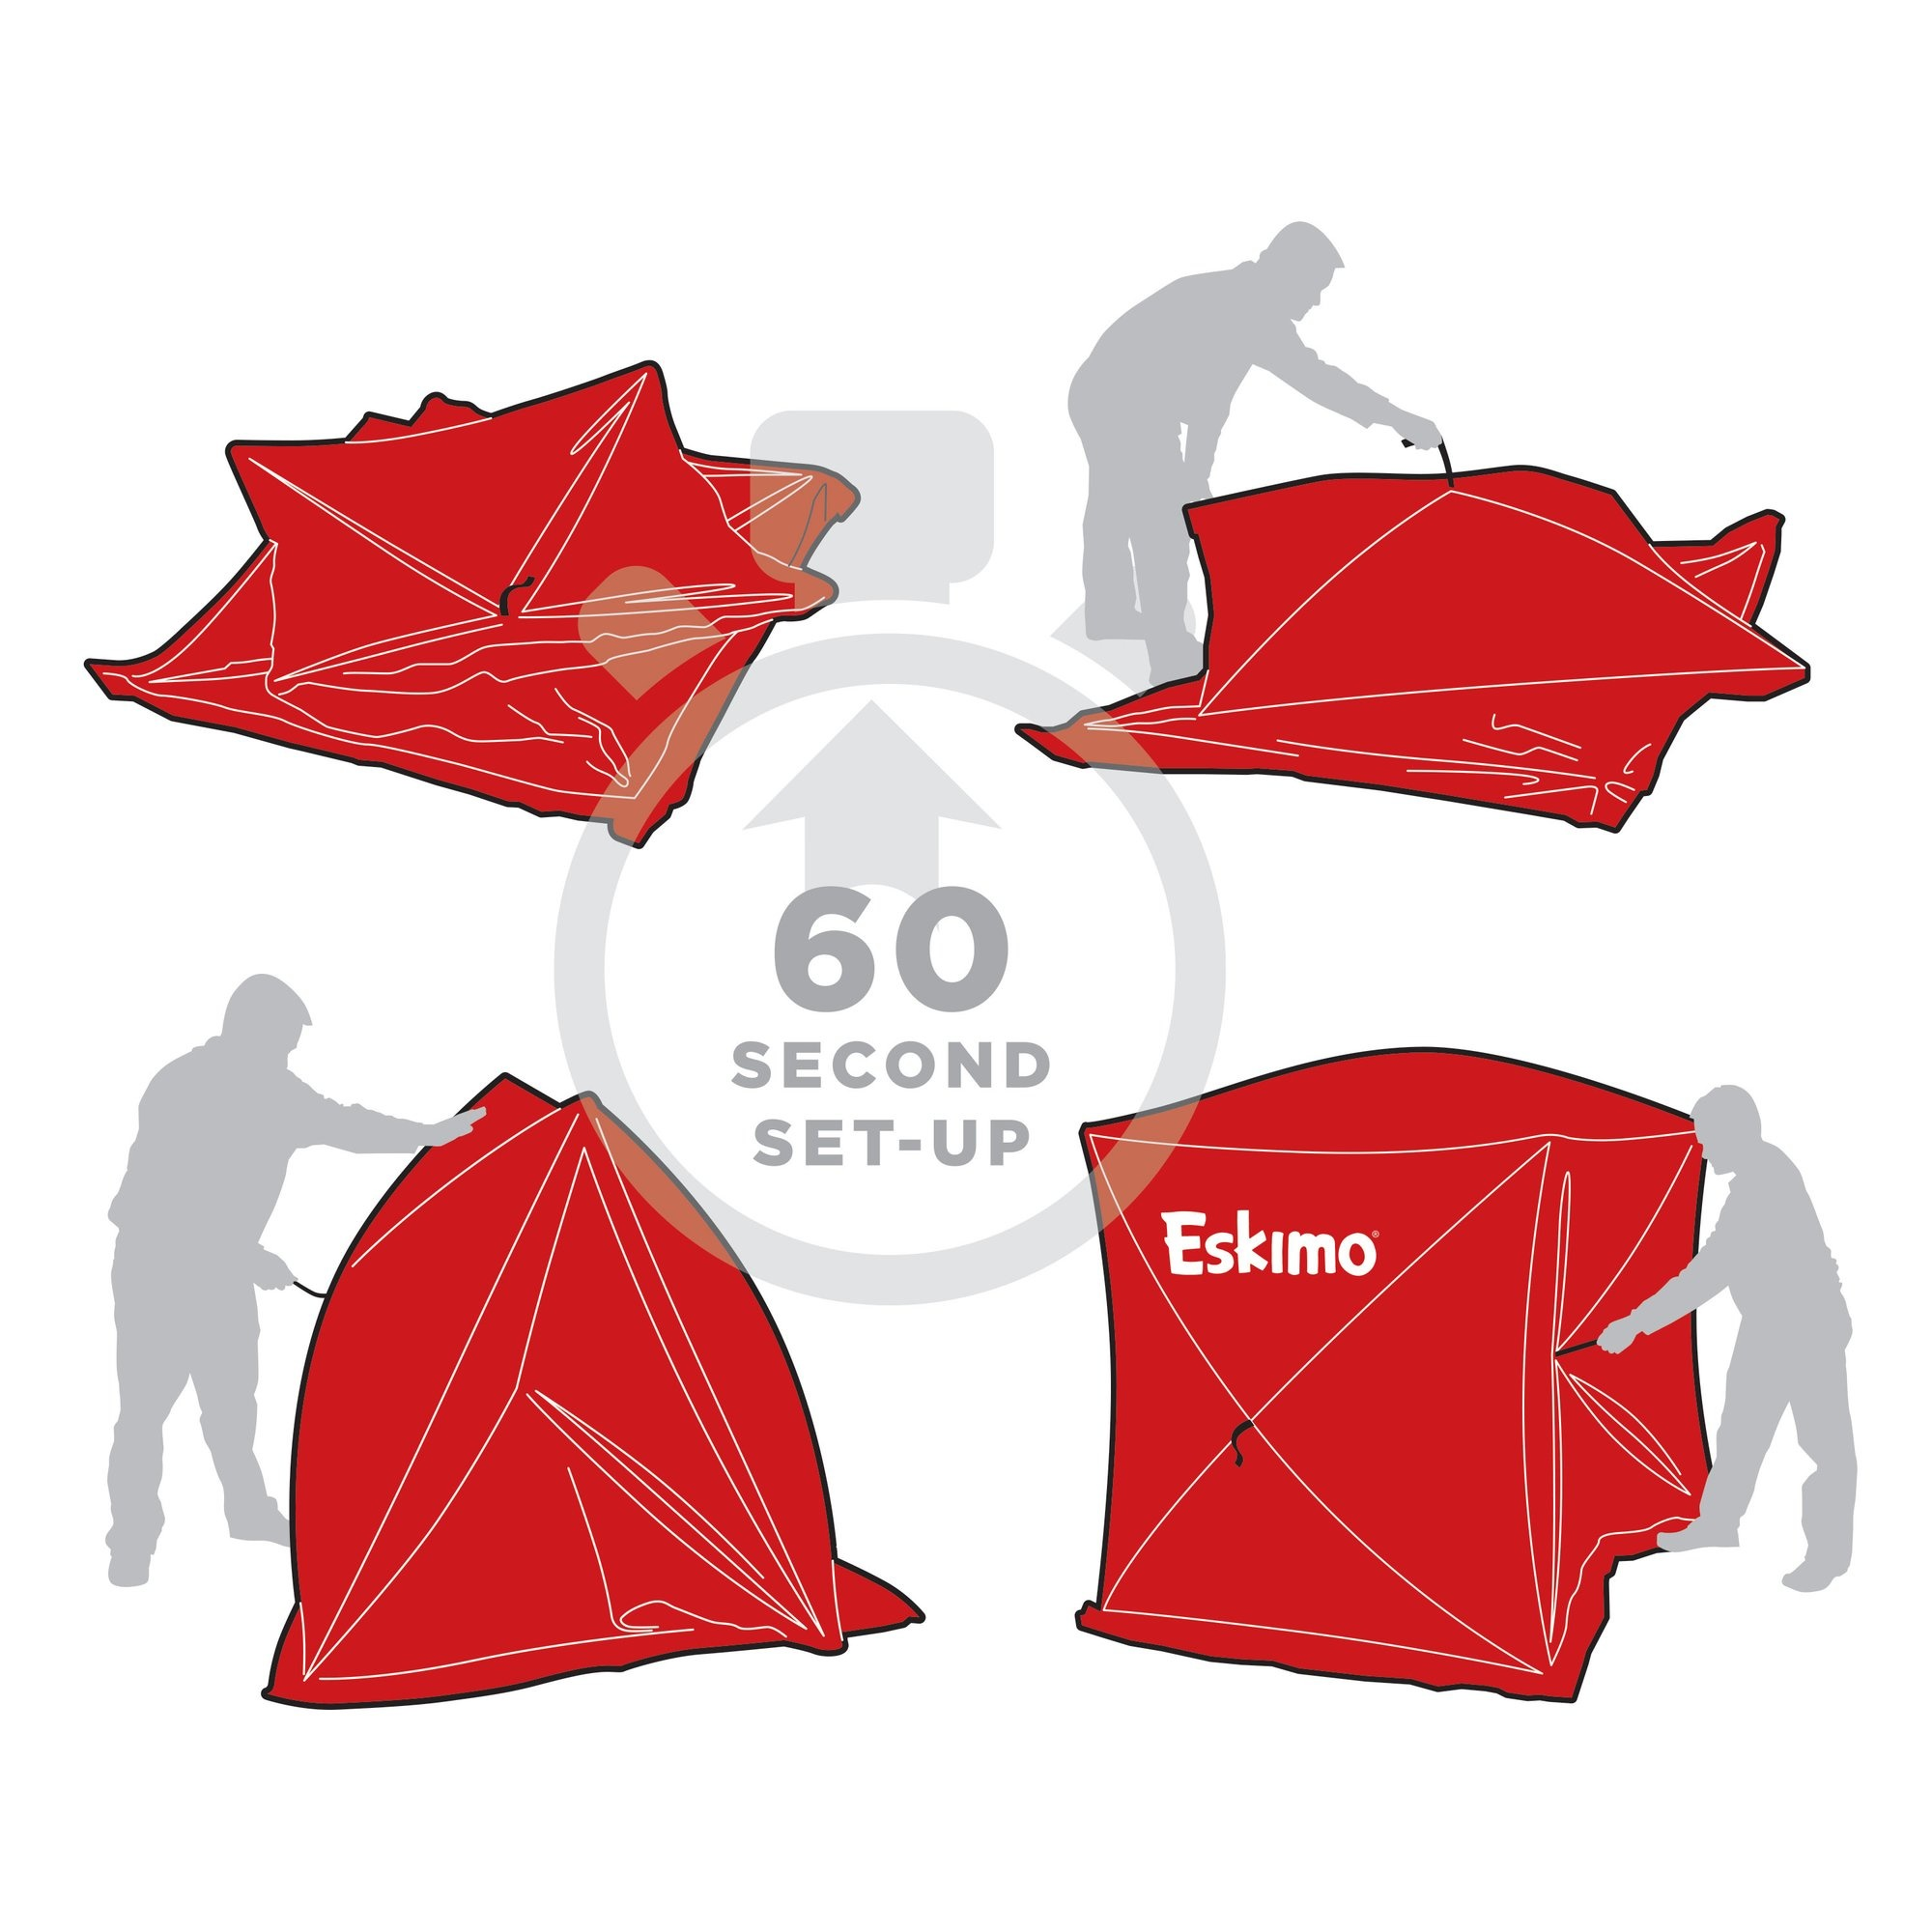 "Eskimo Eskimo Quickfish 2-Person Pop-Up Ice Hut 60""x60"""